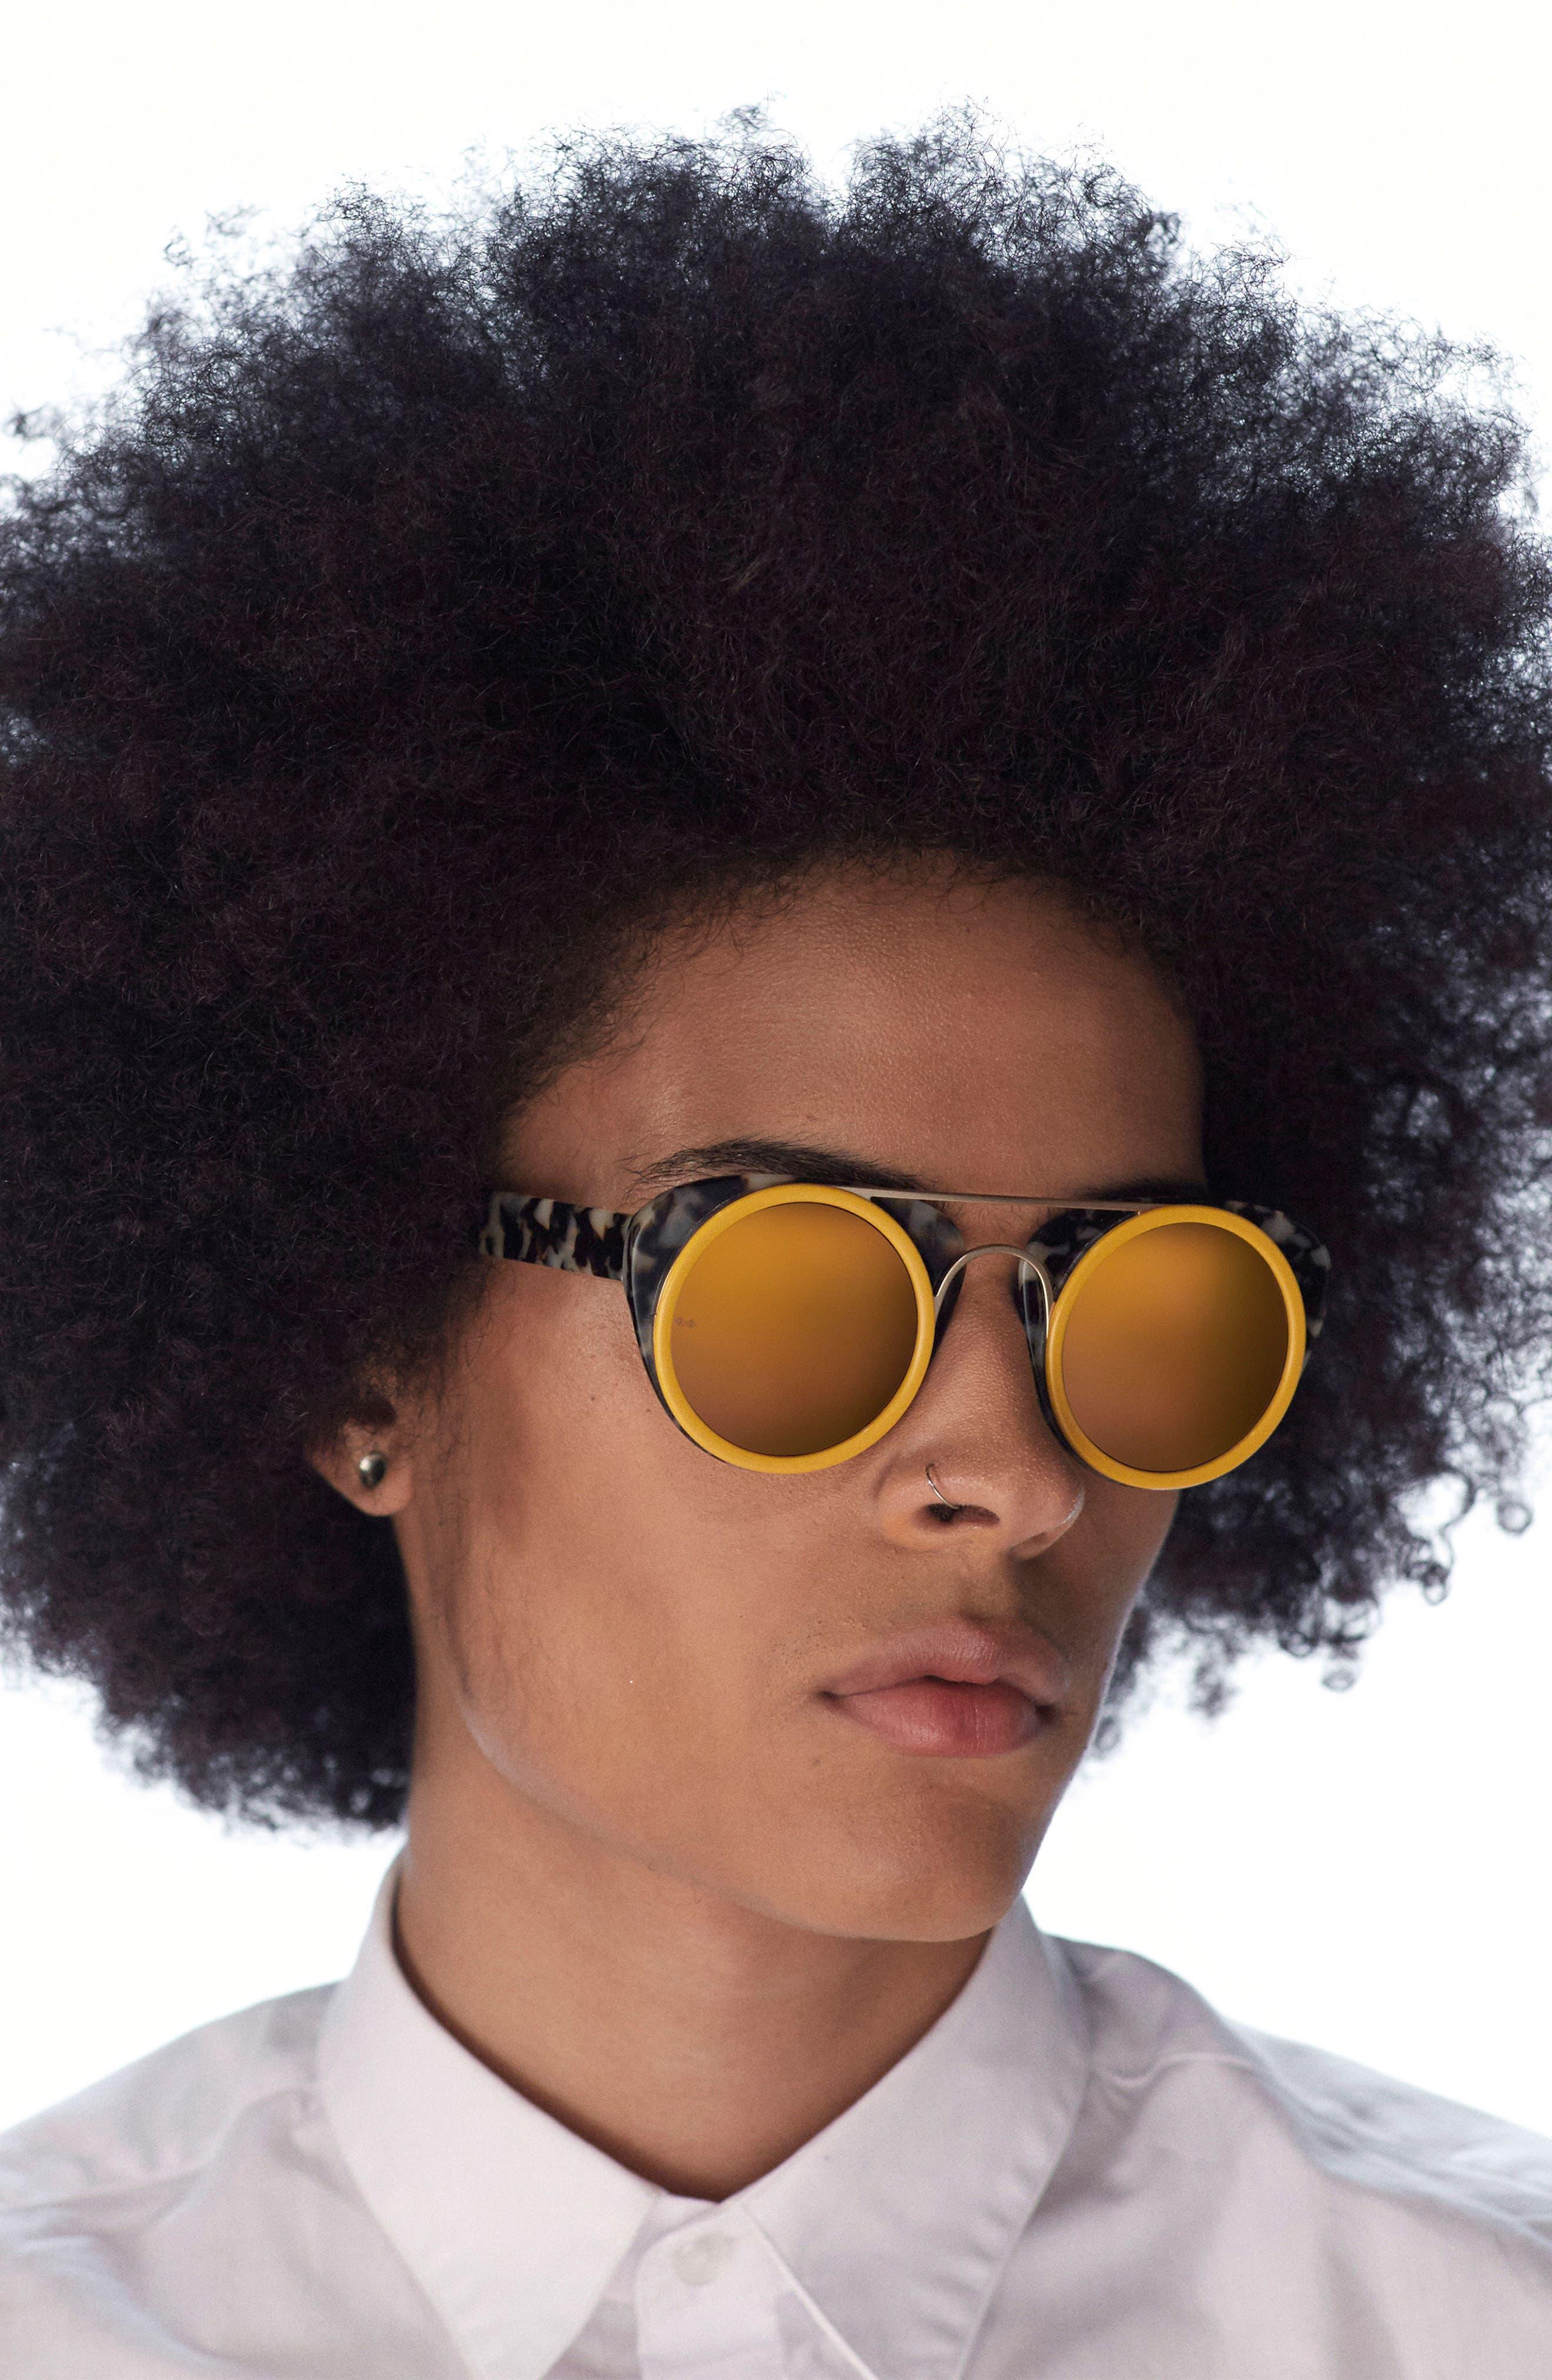 Soda Pop II 53mm Square Sunglasses,                             Alternate thumbnail 2, color,                             Ivory/ Ginger Tortoise/ Silver